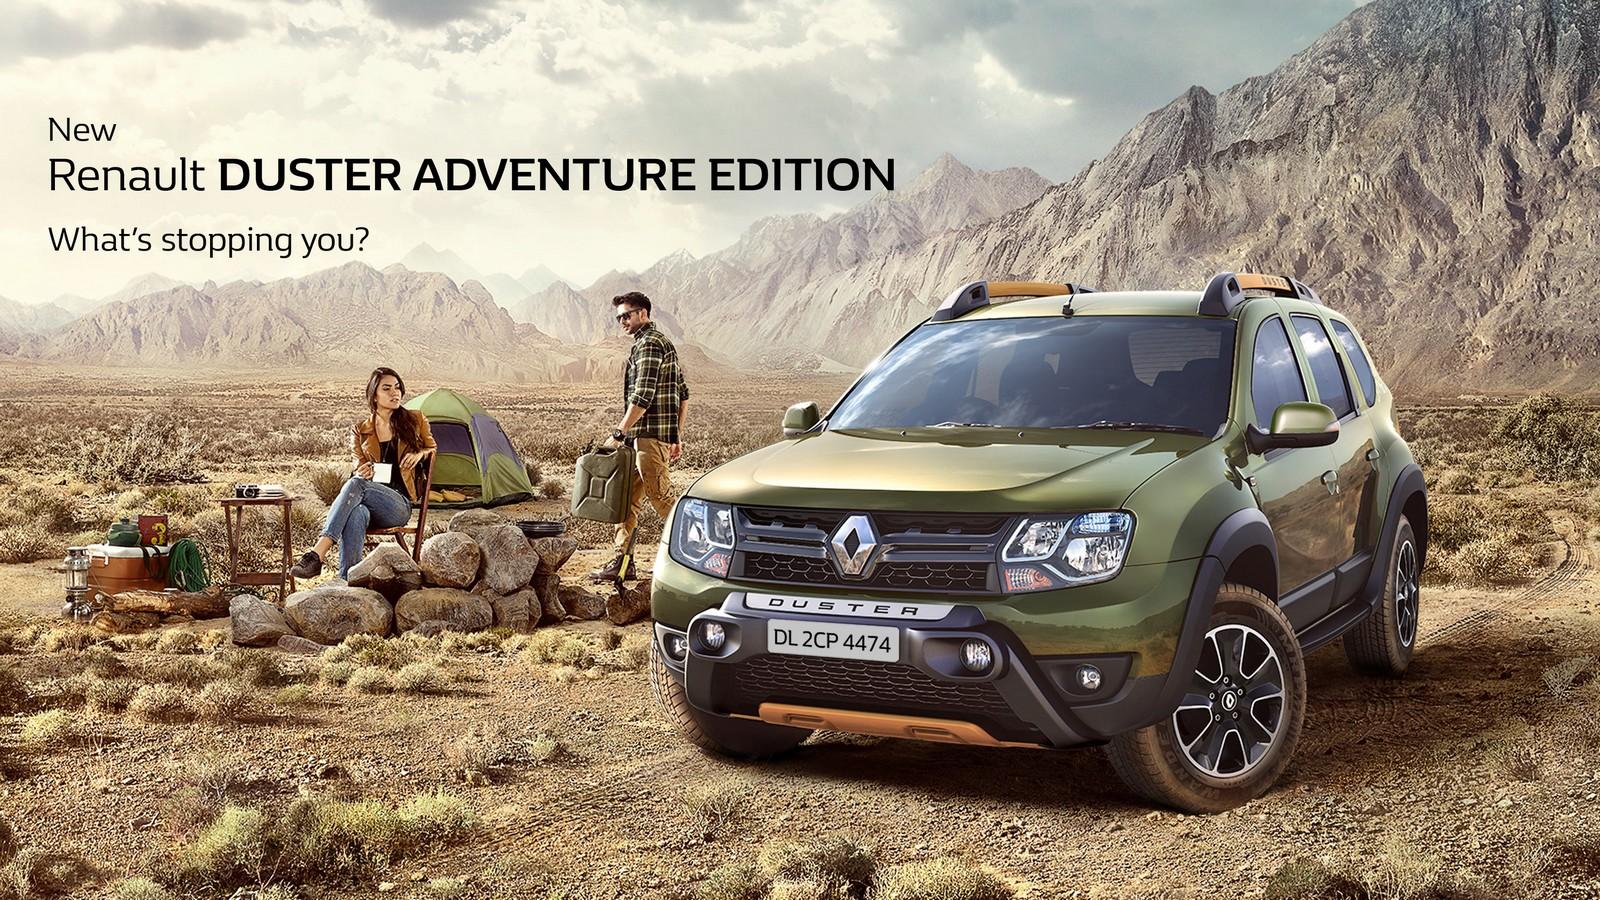 renault-duster-adventure-edition-1